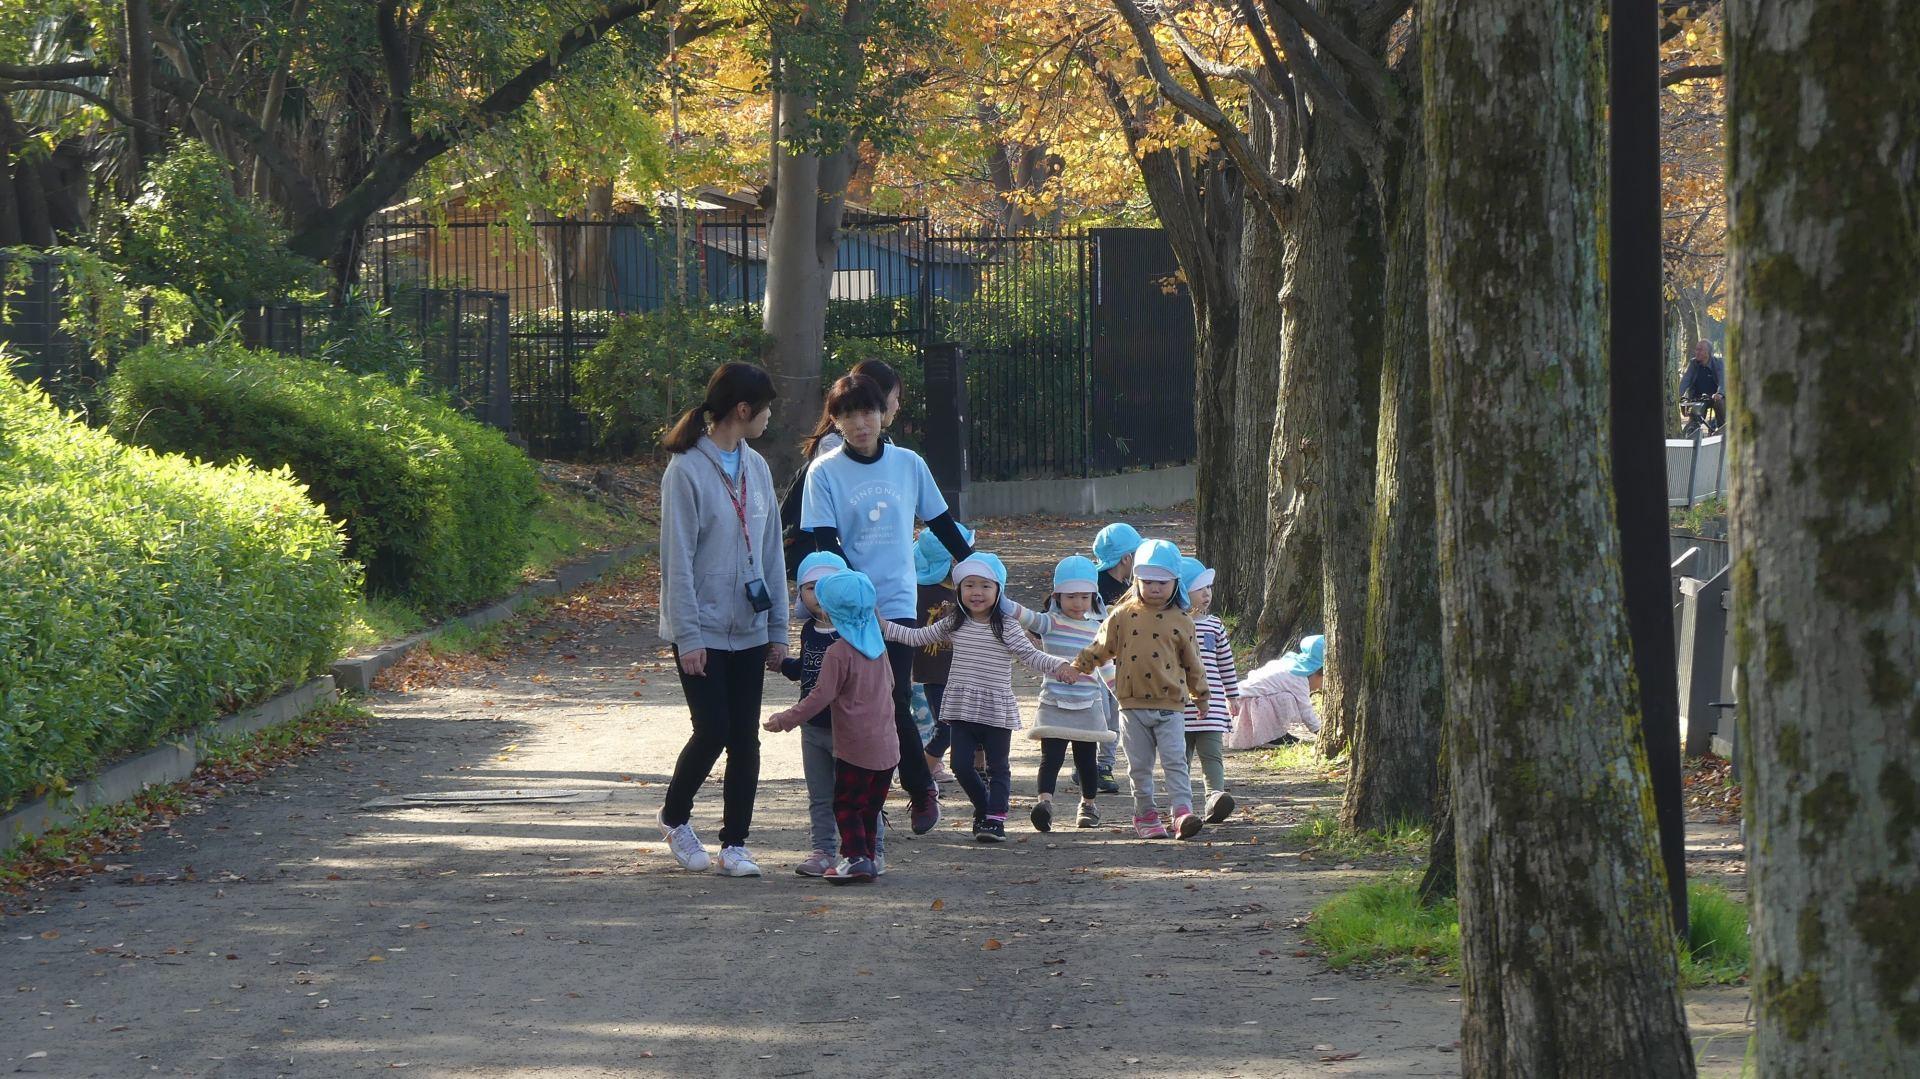 秋色の散歩道_a0185081_23260607.jpg